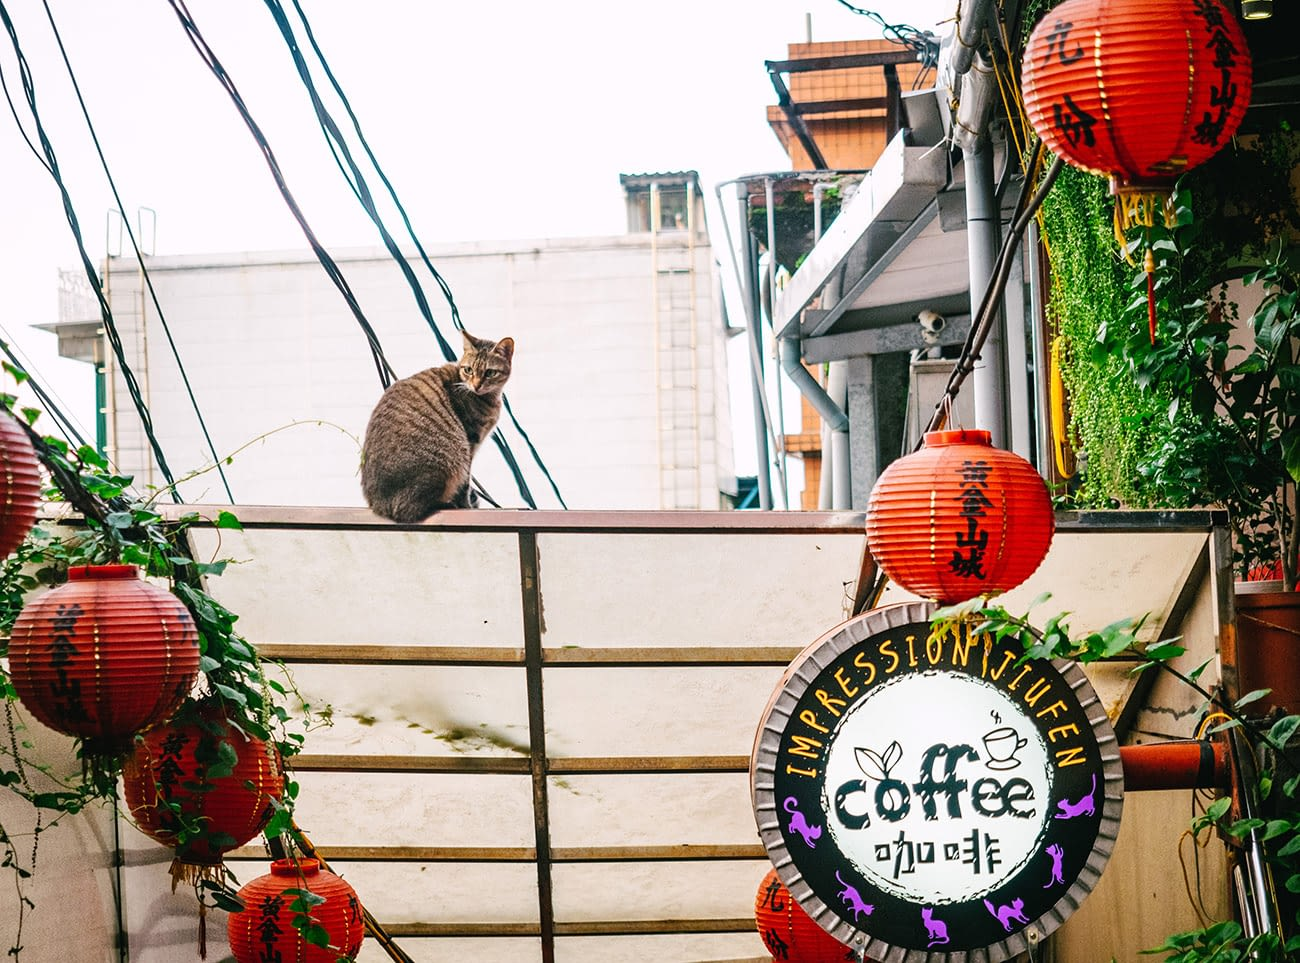 Taipei Jiufen - Cat on the roof